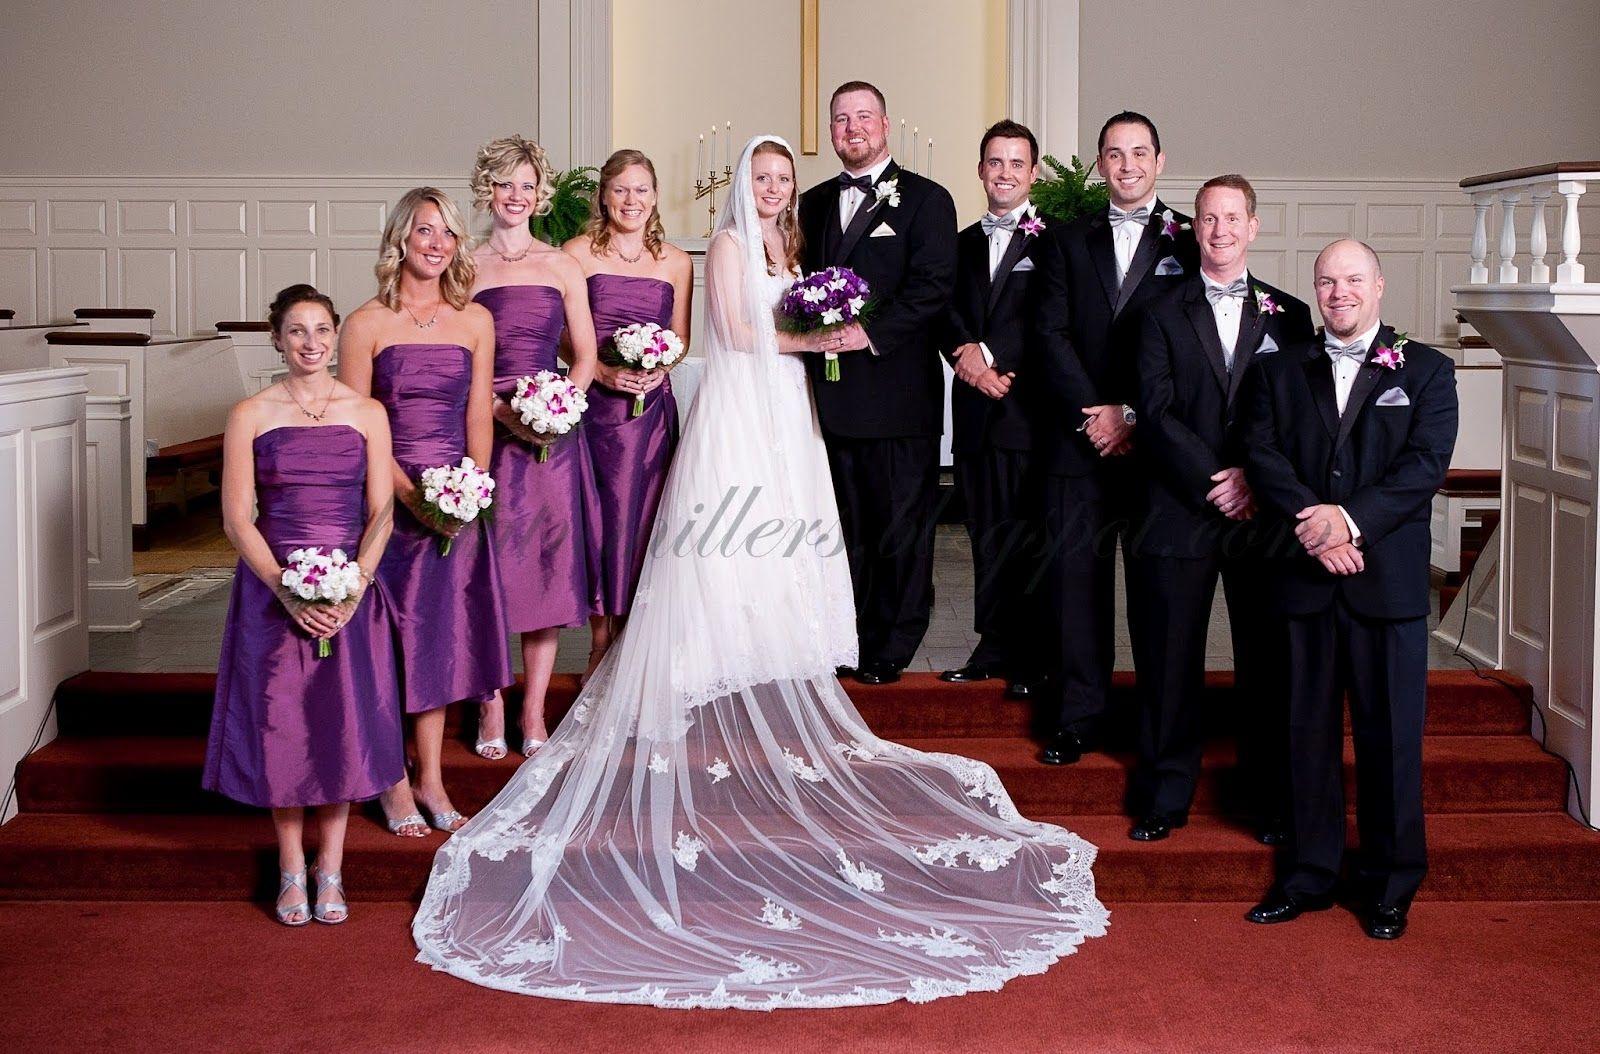 20 Ree Drummond Wedding Ring Check More At Https Eeswl Info 77 Ree Drummond Wedding Ring Ree Drummond Wedding Wedding Dresses Bridesmaid Dresses